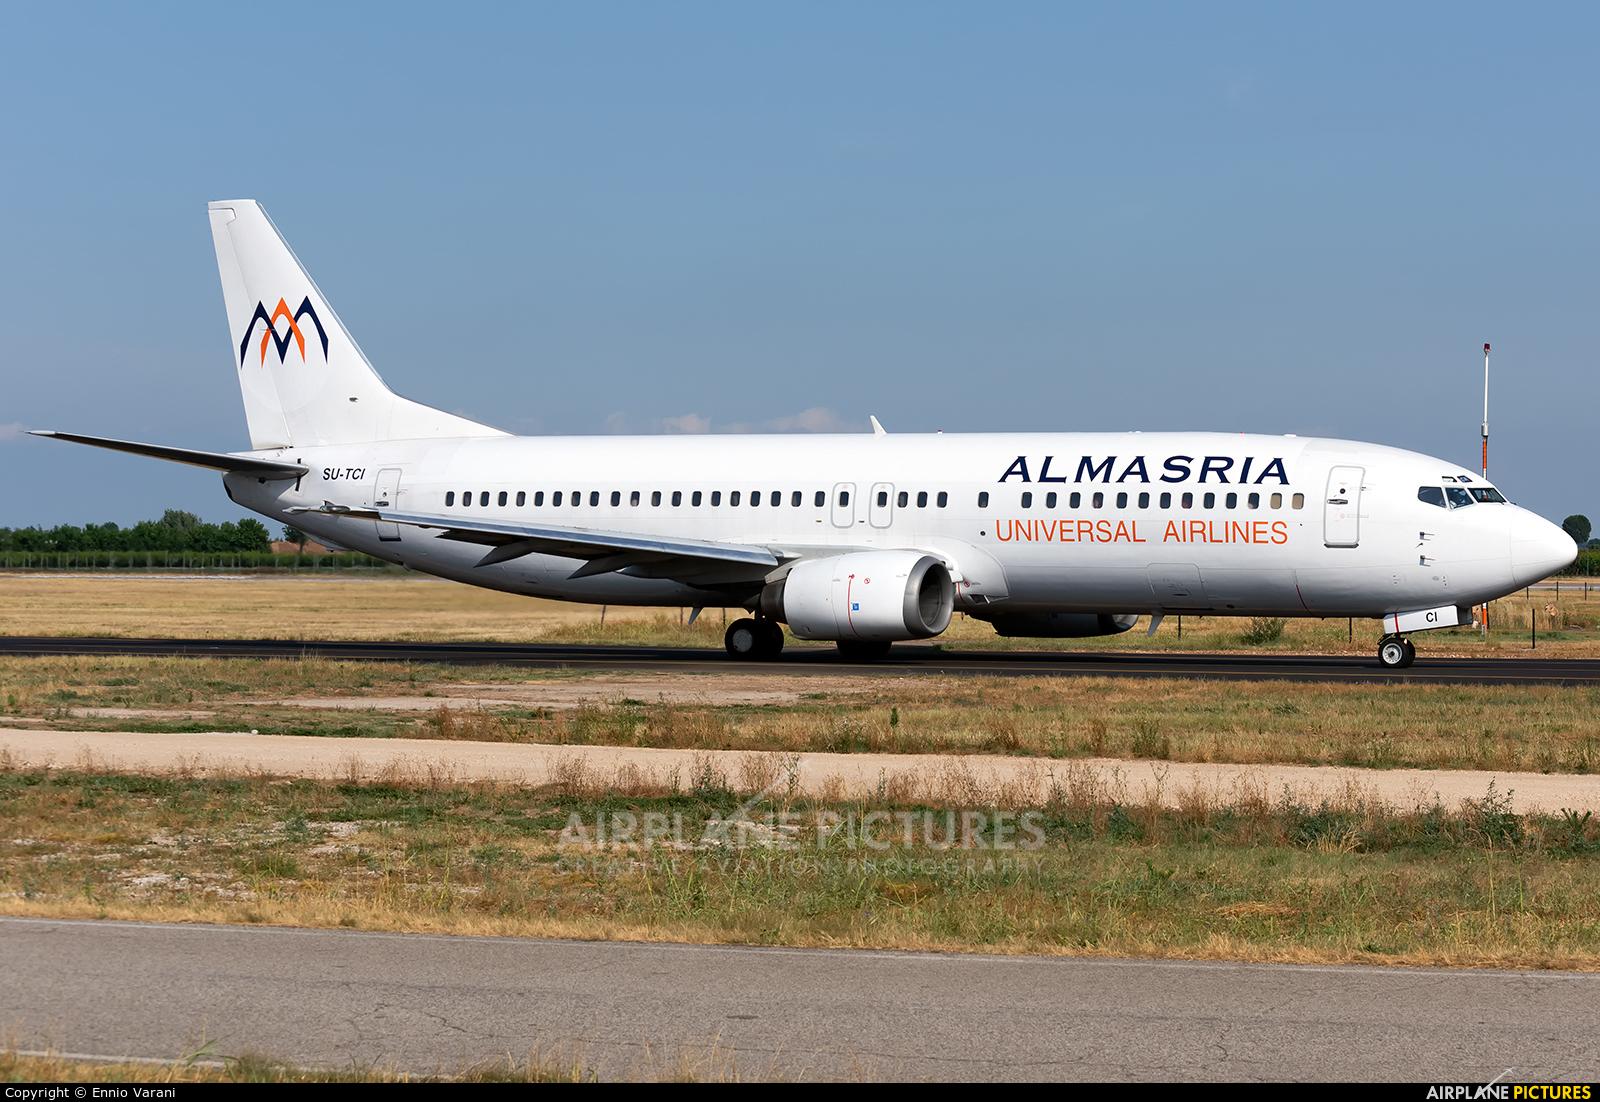 Almasria Universal Airlines SU-TCI aircraft at Verona - Villafranca